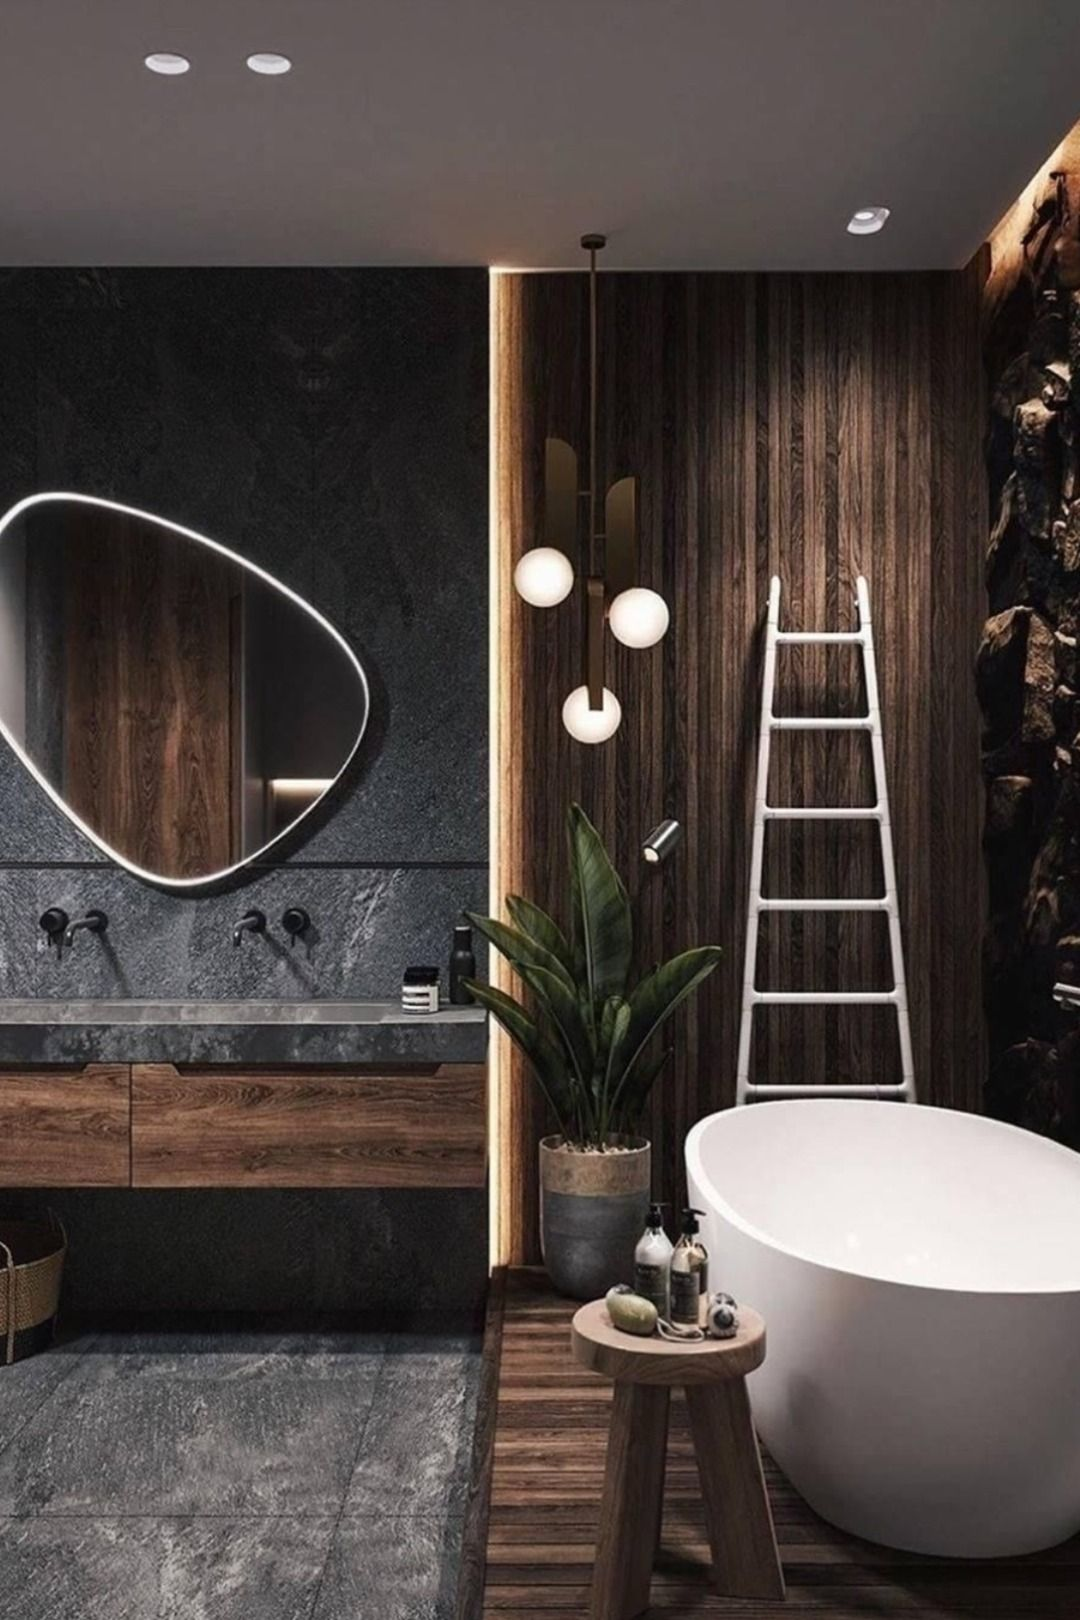 Luxury And Amazing Bathroom Design In 2020 Bathroom Interior Design Bathroom Design Luxury Bathroom Inspiration